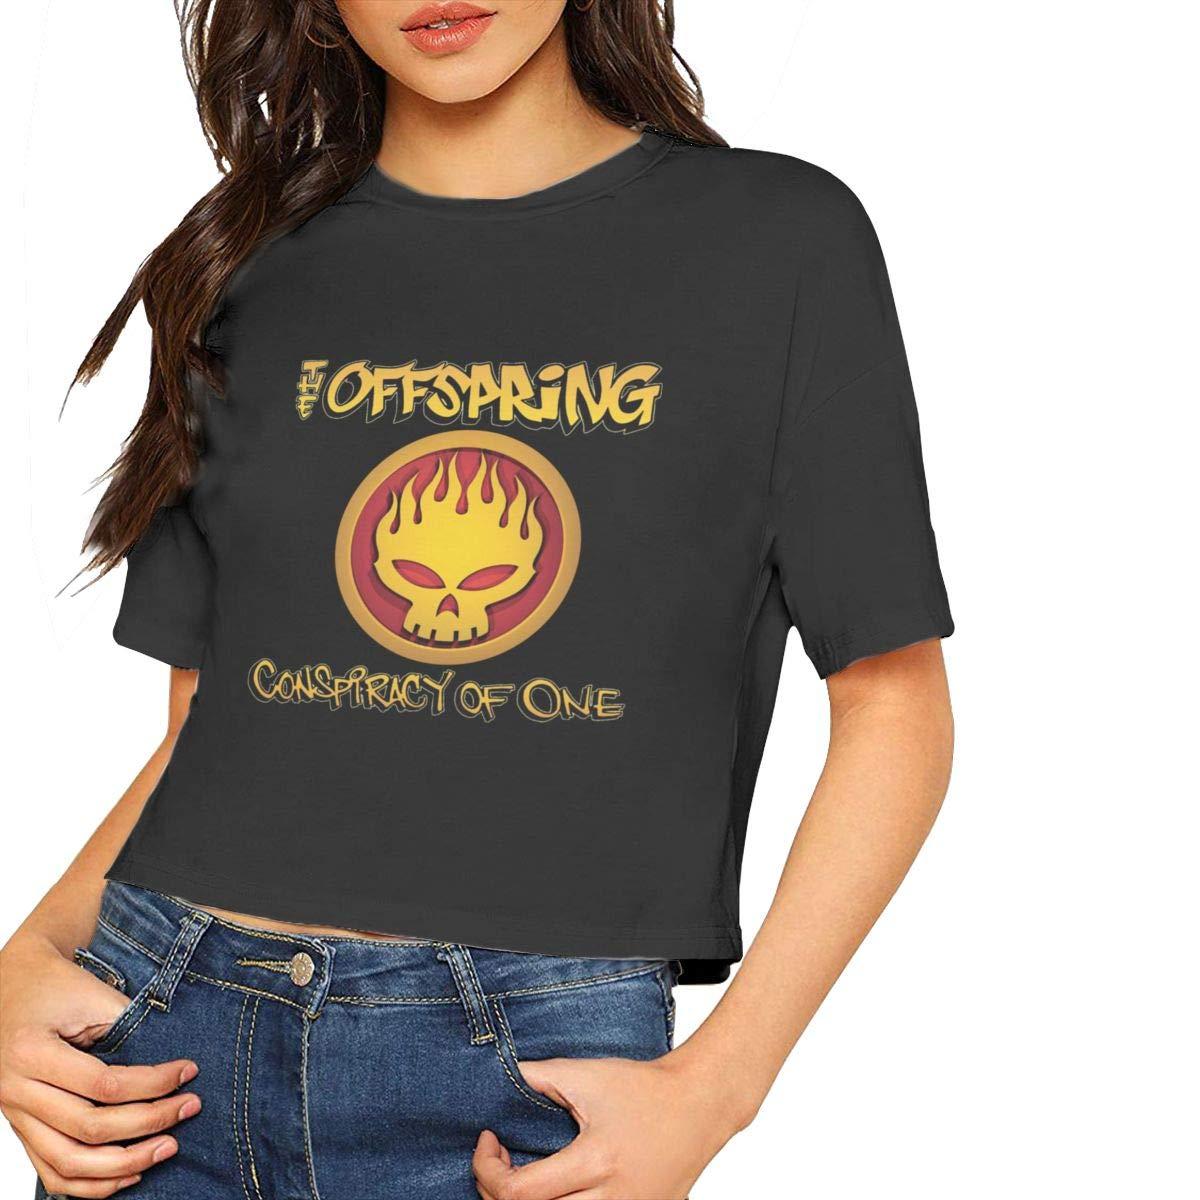 Seuriamin The Offspring Conspiracy Of One Summer Short Sleeve Leak Navel Crew Neck T Shirt